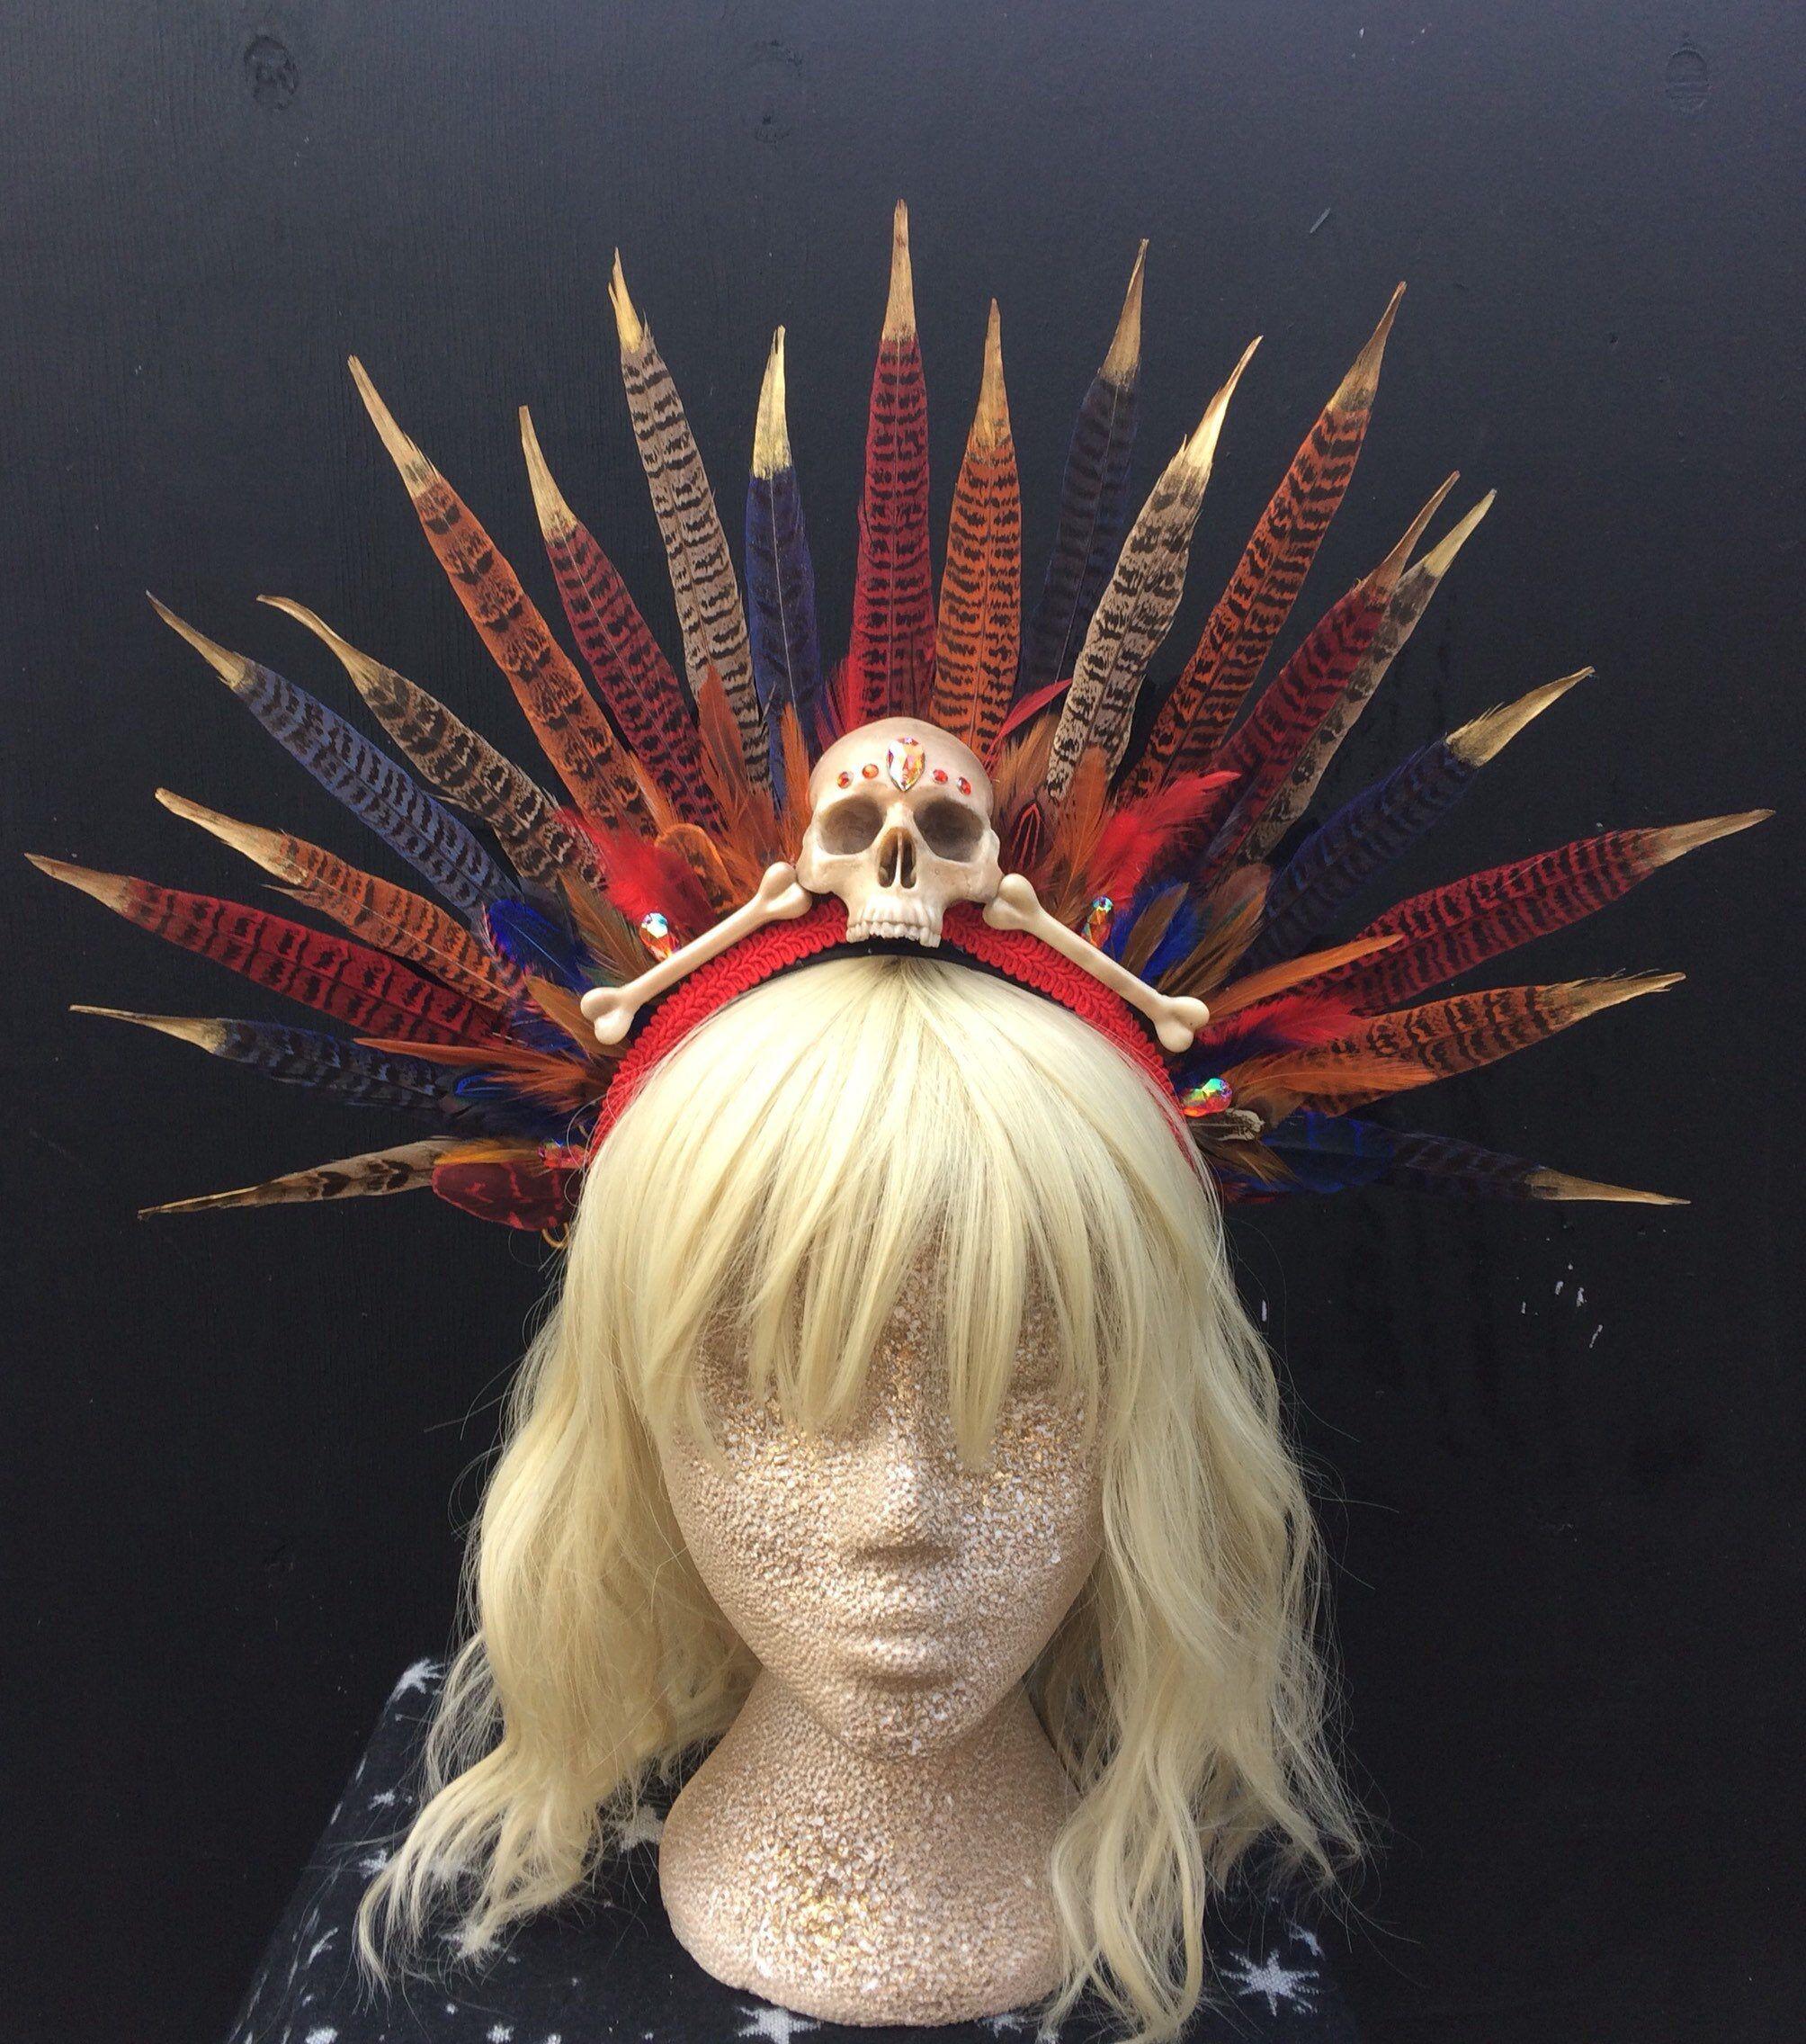 Voodoo Priestess Feather Headdress   Feather headdress